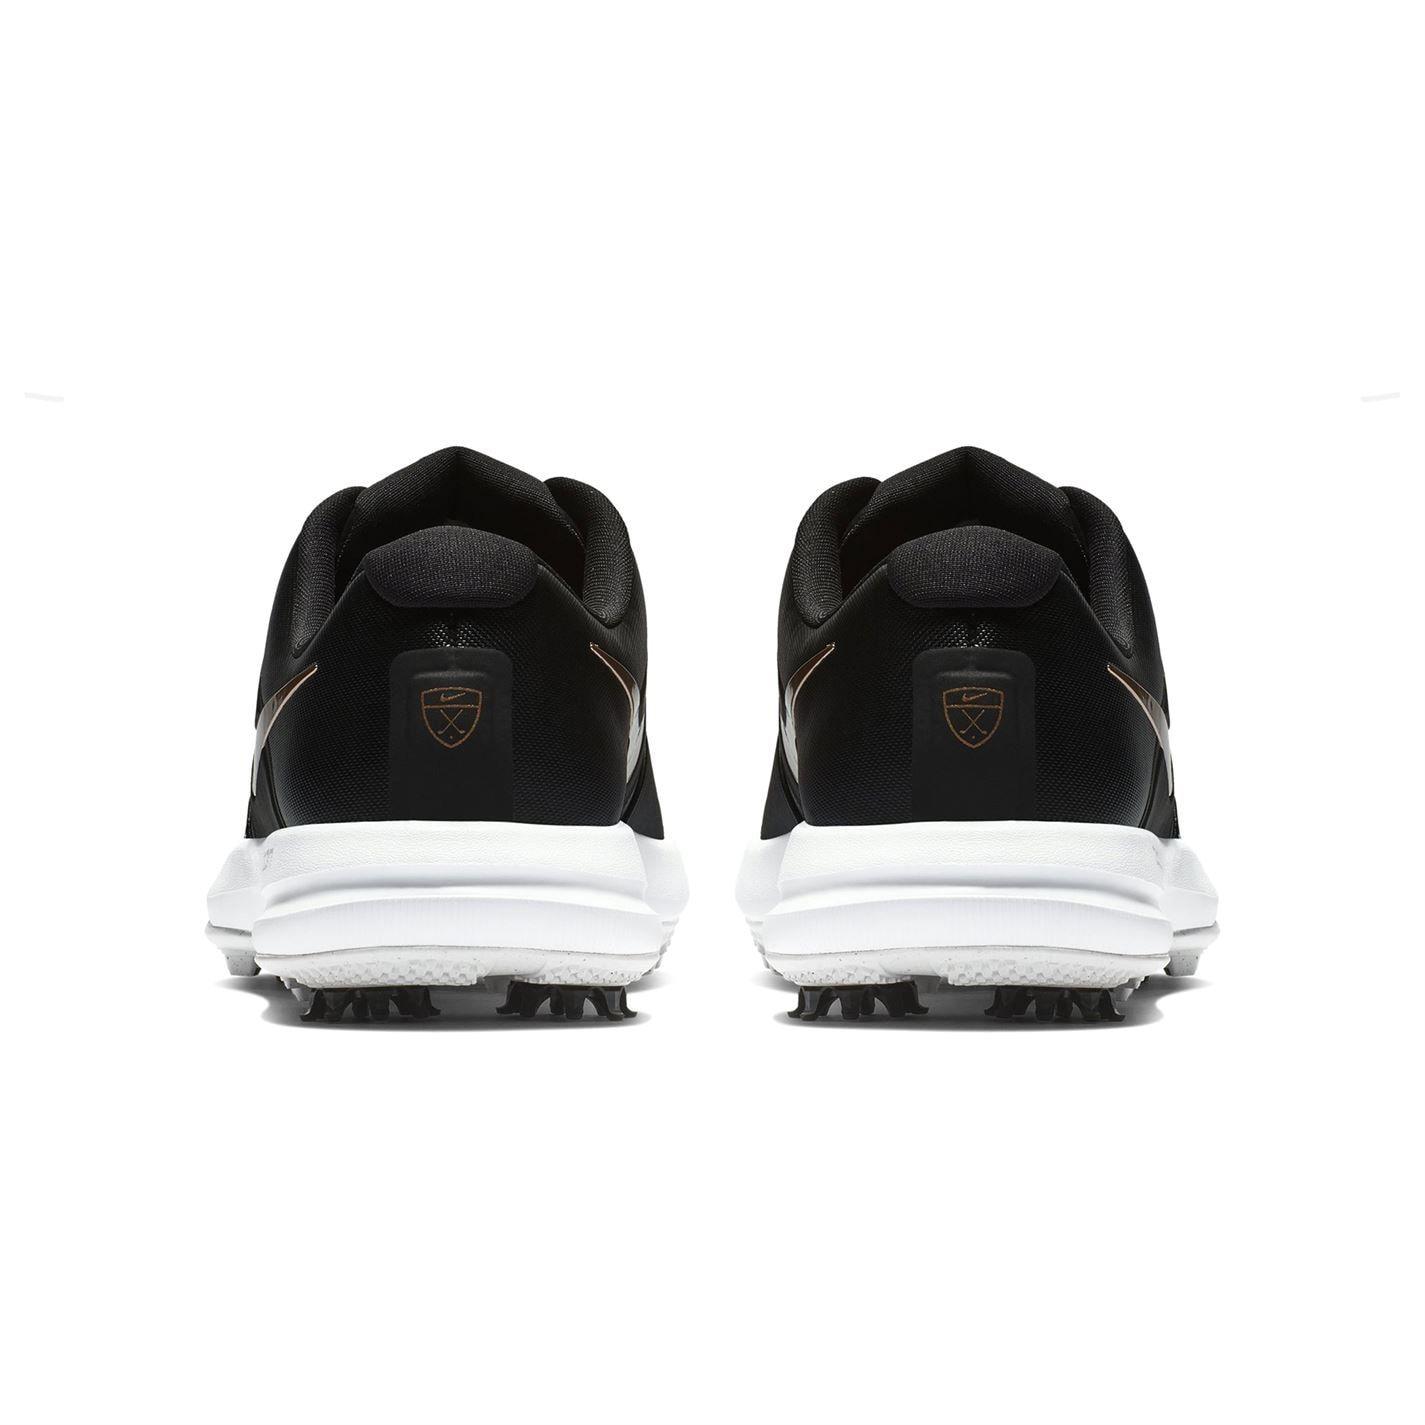 e214dabb5df Nike Air Zoom Victory Ladies Golf Shoes. Рейтинг: - 10%. Thumbnail 1  Thumbnail 1 Thumbnail 1 Thumbnail 1 ...